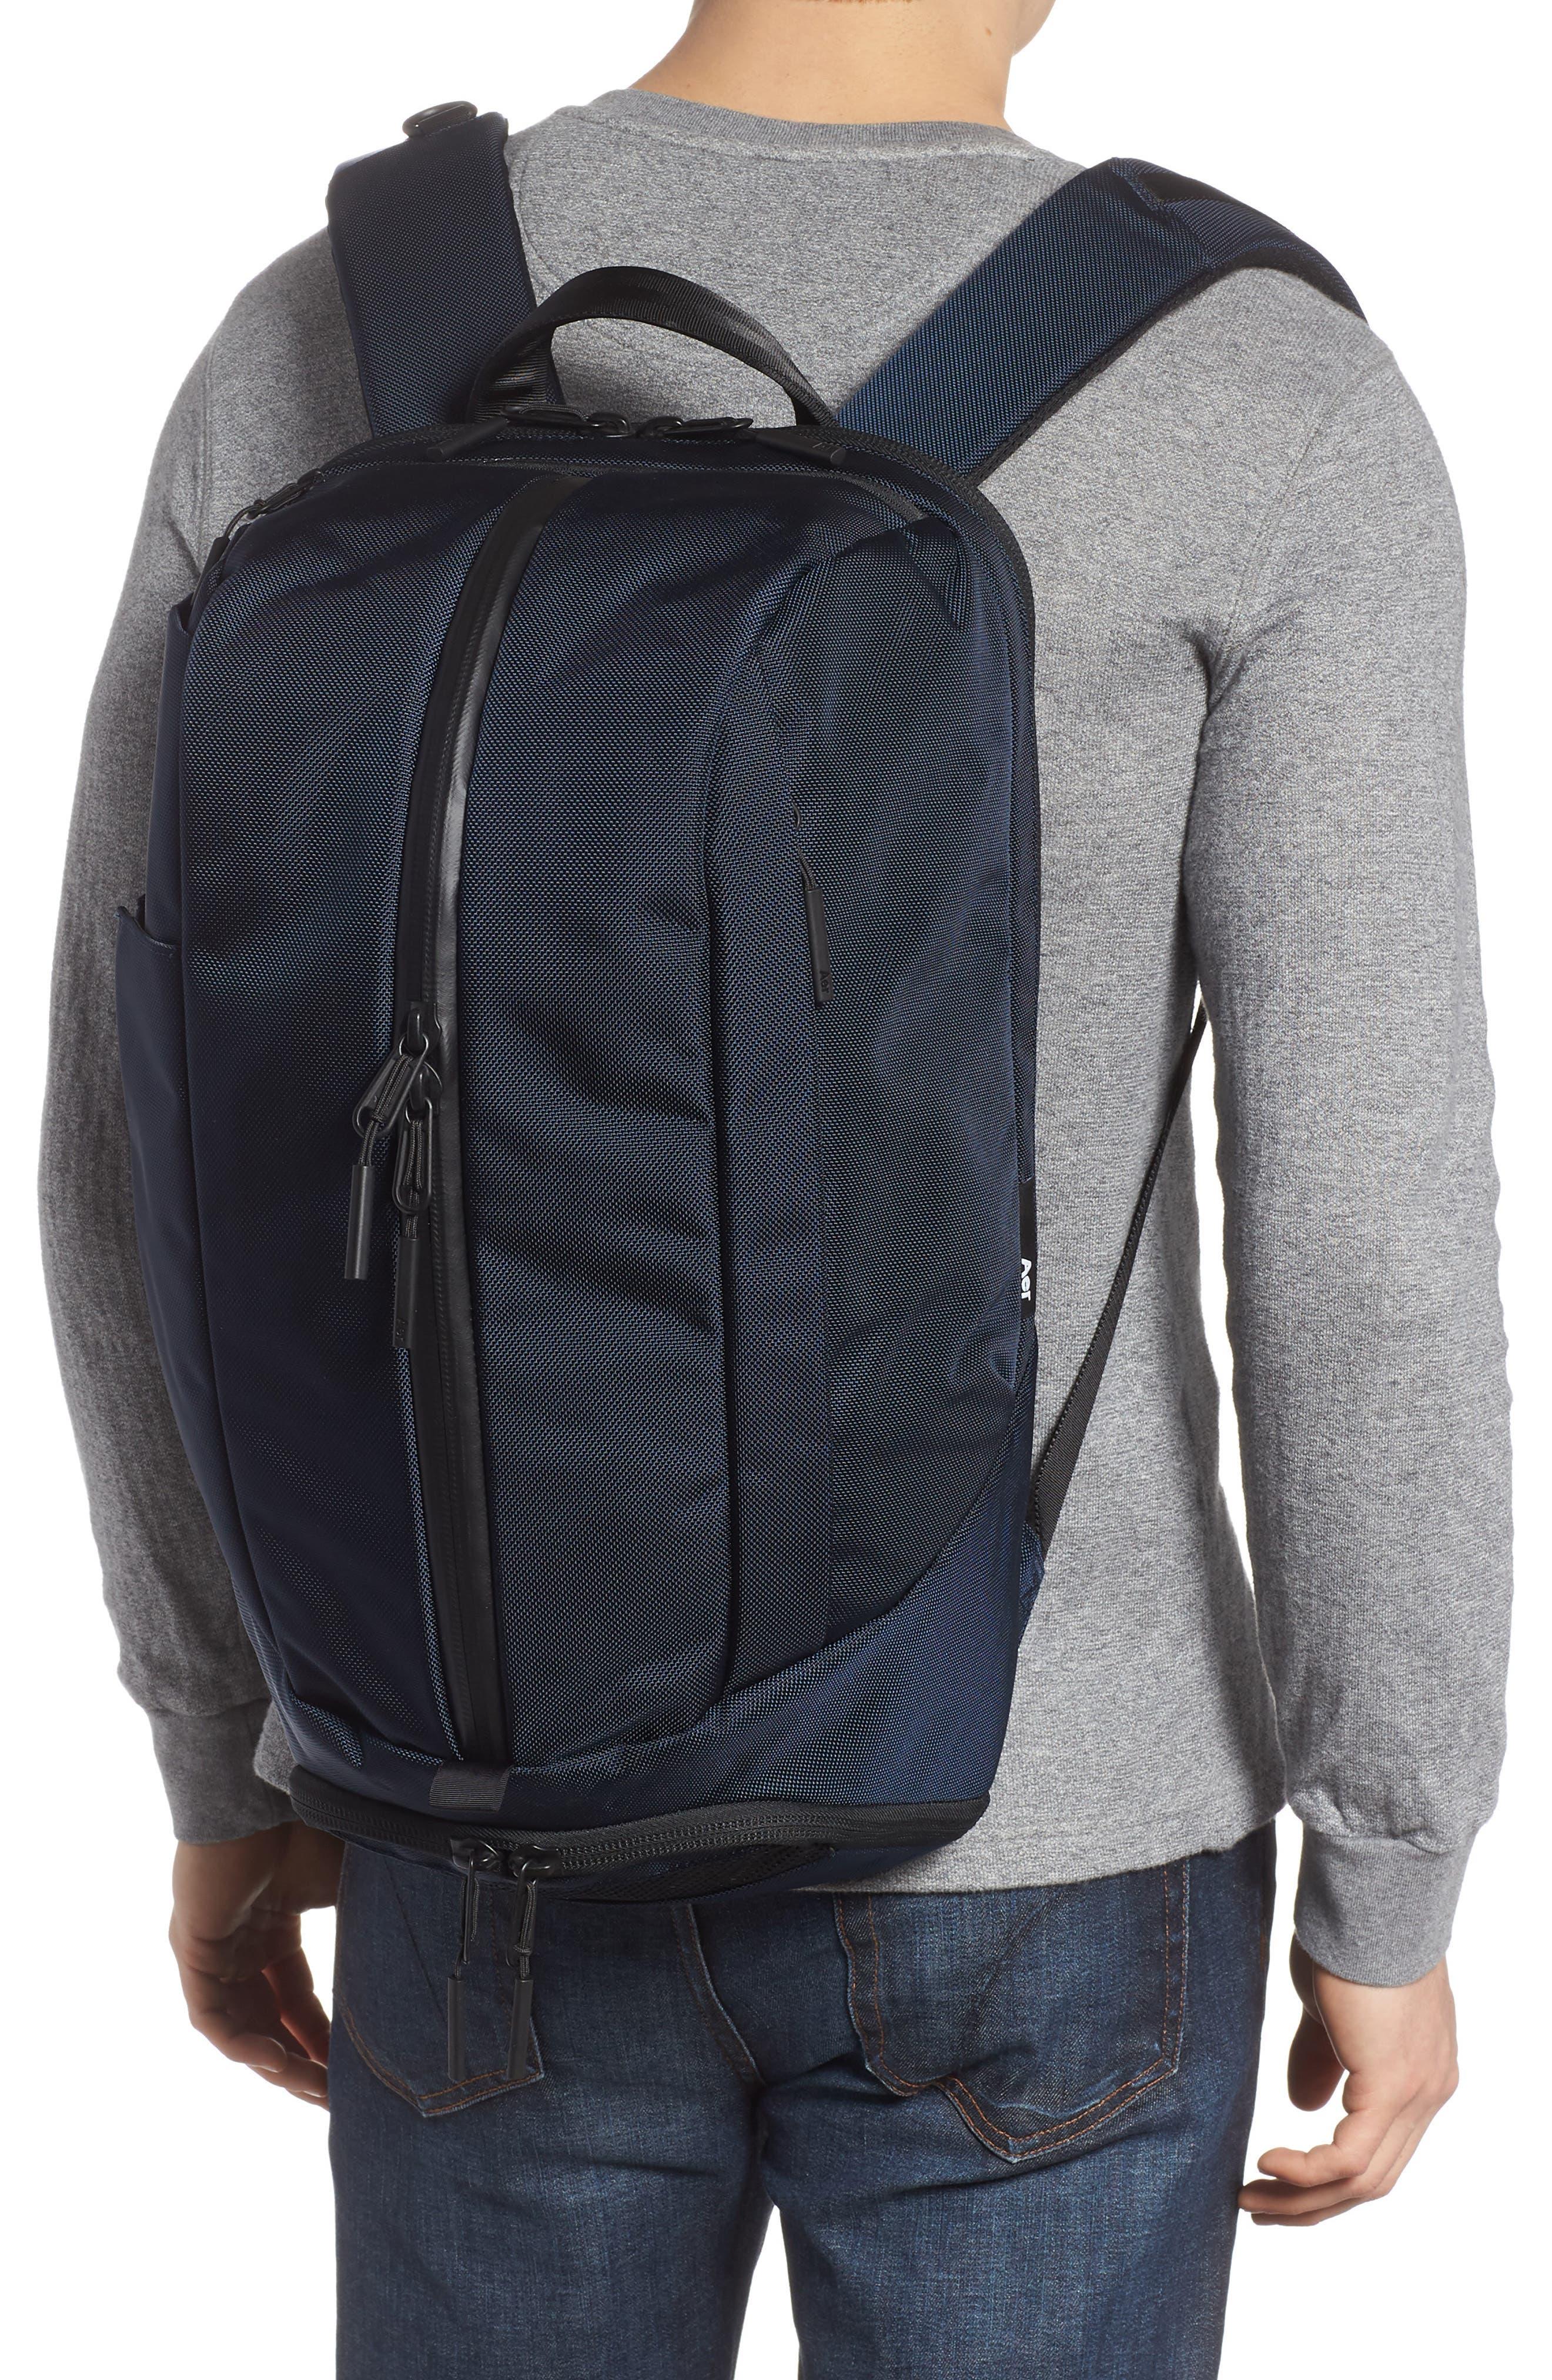 Duffel Pack 2 Convertible Backpack,                             Alternate thumbnail 2, color,                             Navy